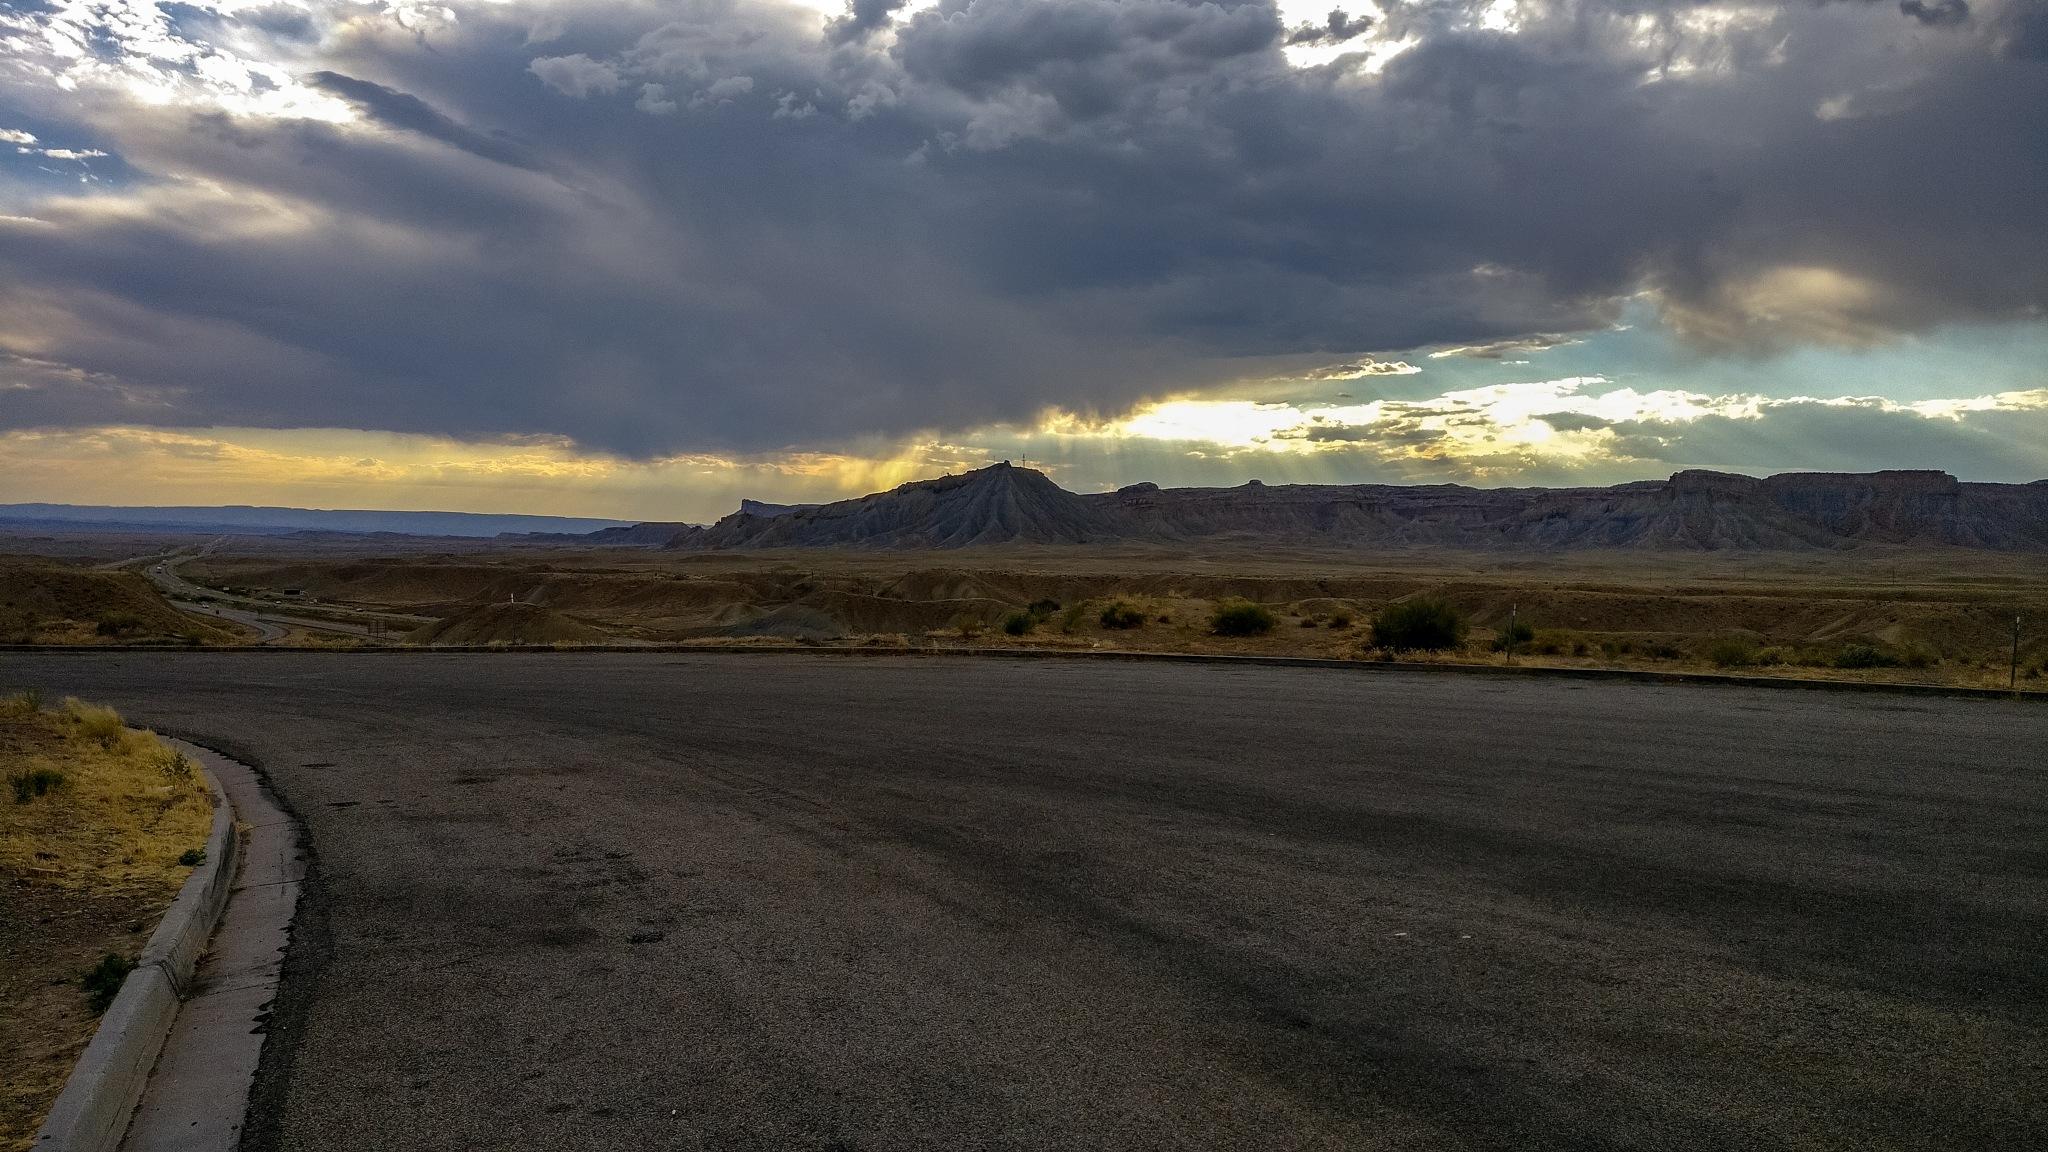 Crescent Junction, Utah by Orion Cochran